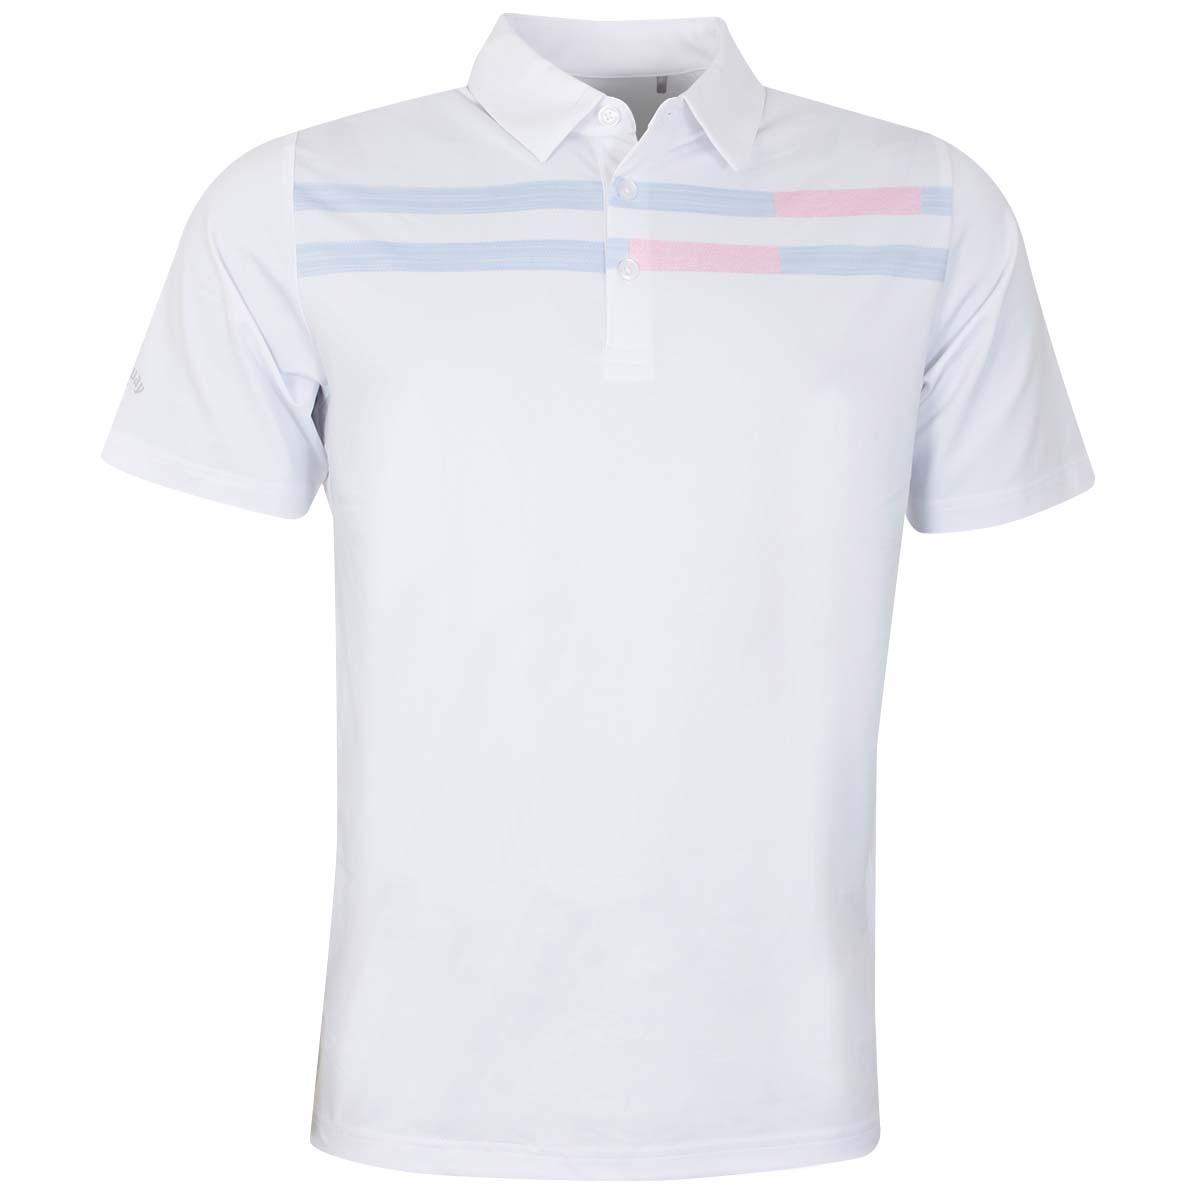 bacf184b Details about Callaway Mens 2019 Linear Printed Chevron Tour Two-Tone Golf  Polo Shirt